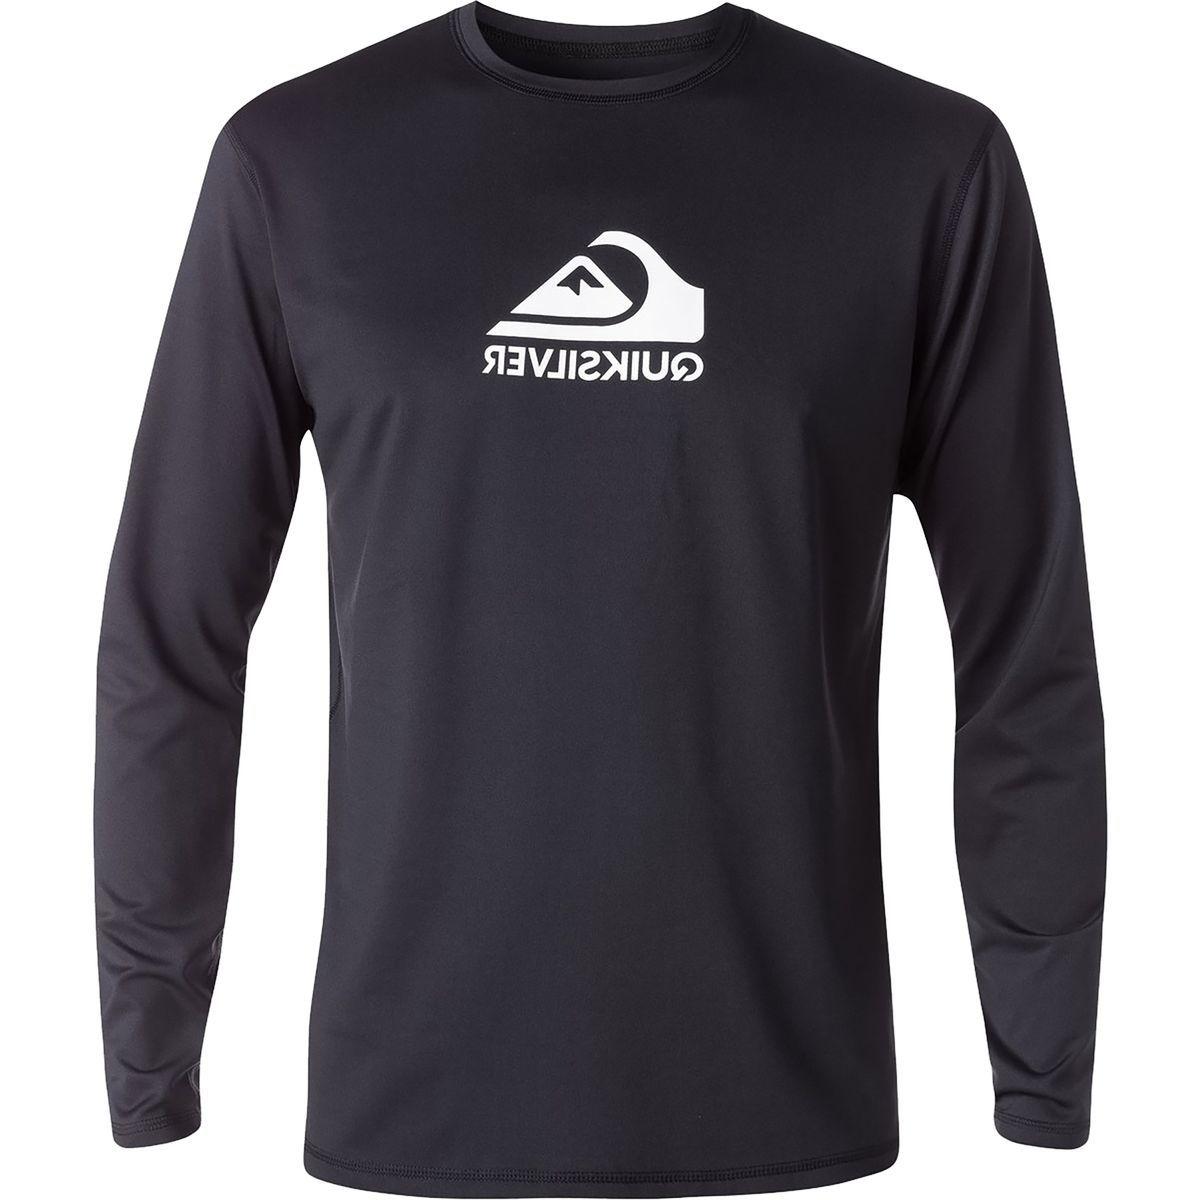 Quiksilver Solid Streak Long-Sleeve Rashguard - Men's